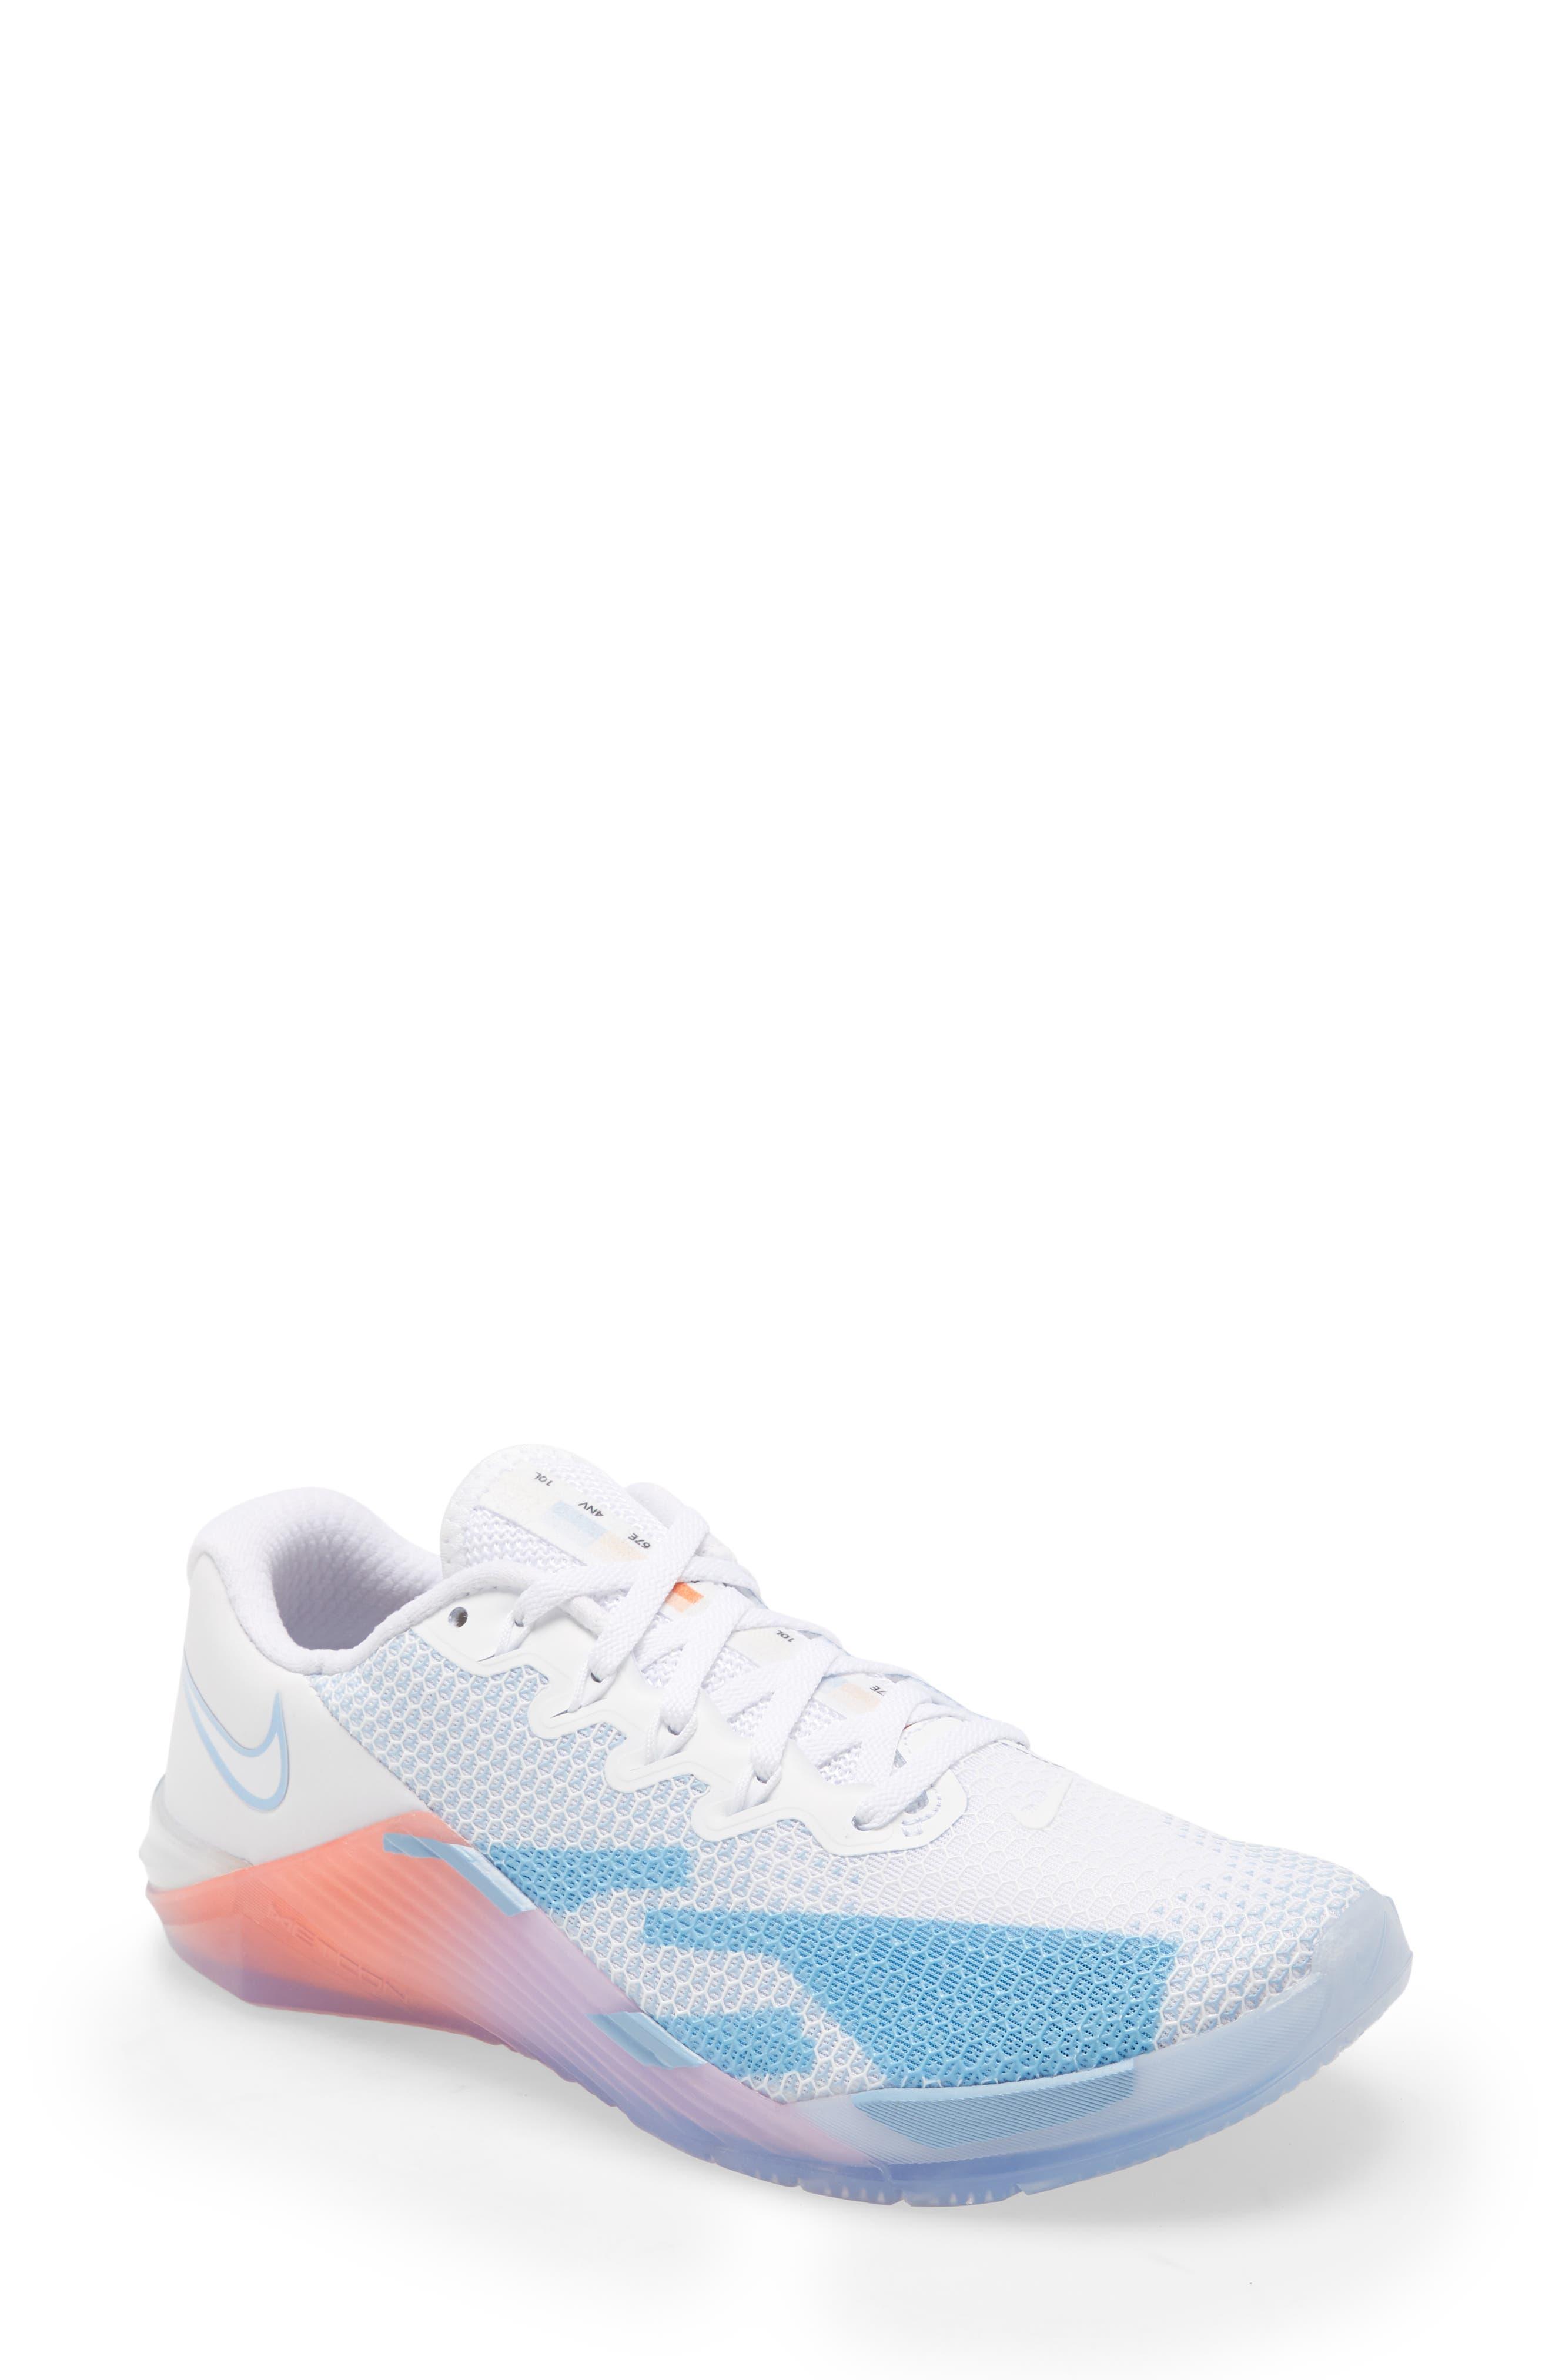 Nike Metcon 5 Premium Training Shoe